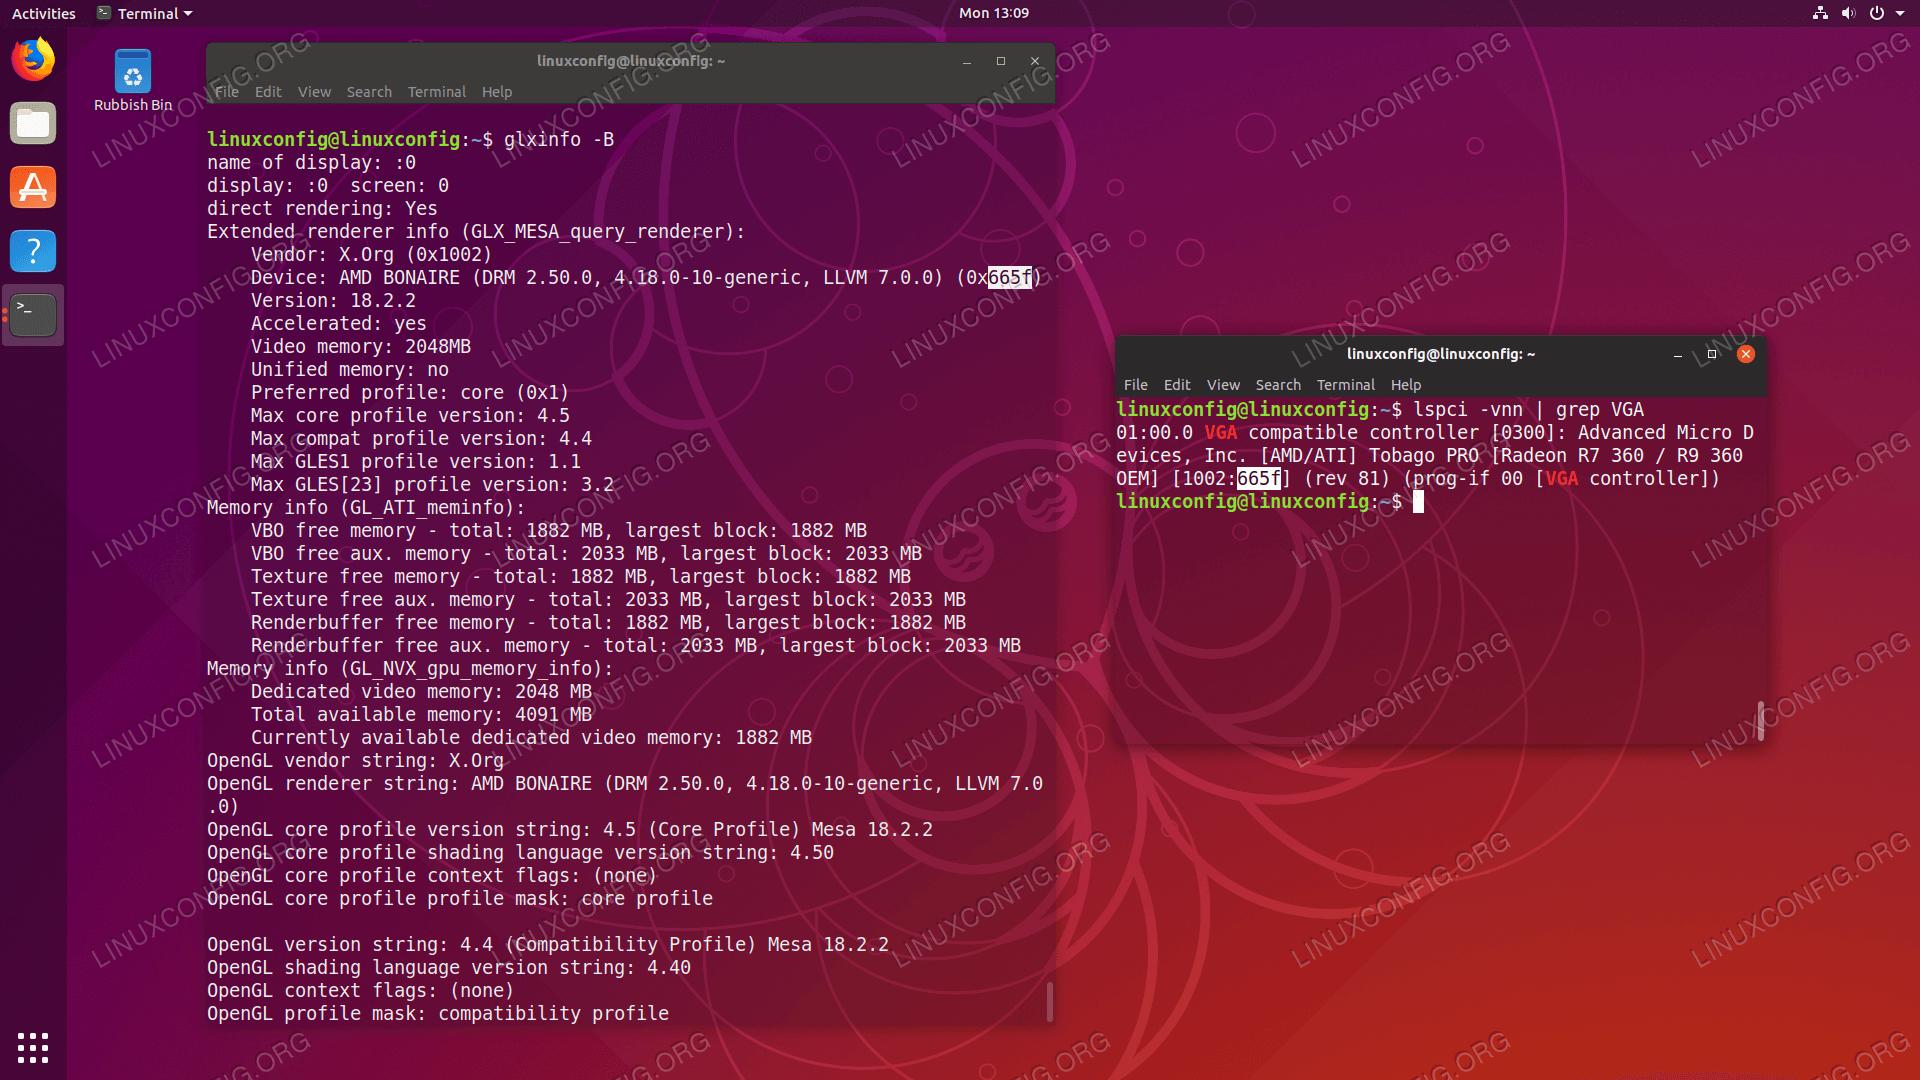 Mesa AMD Radeon graphic card driver support on Ubuntu 18.10